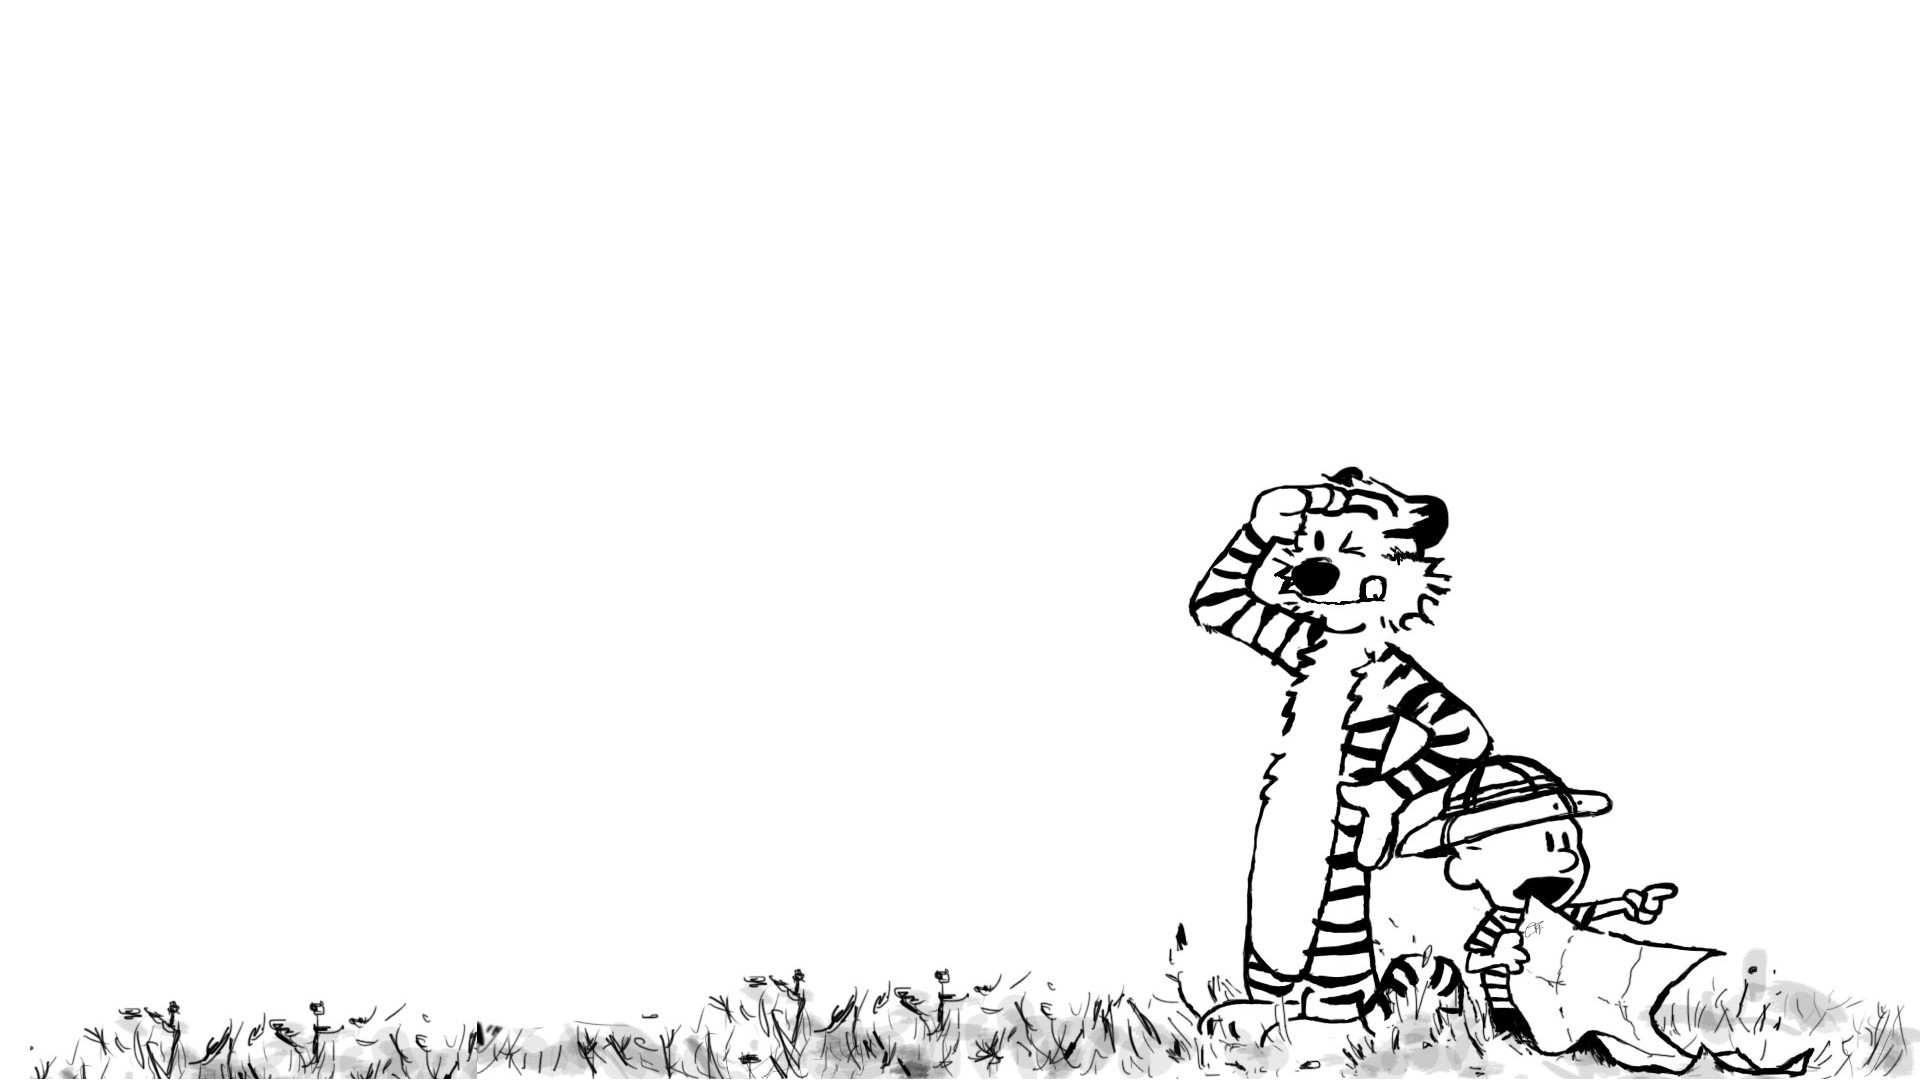 Calvin And Hobbes Stars Wallpaper 1920x1080